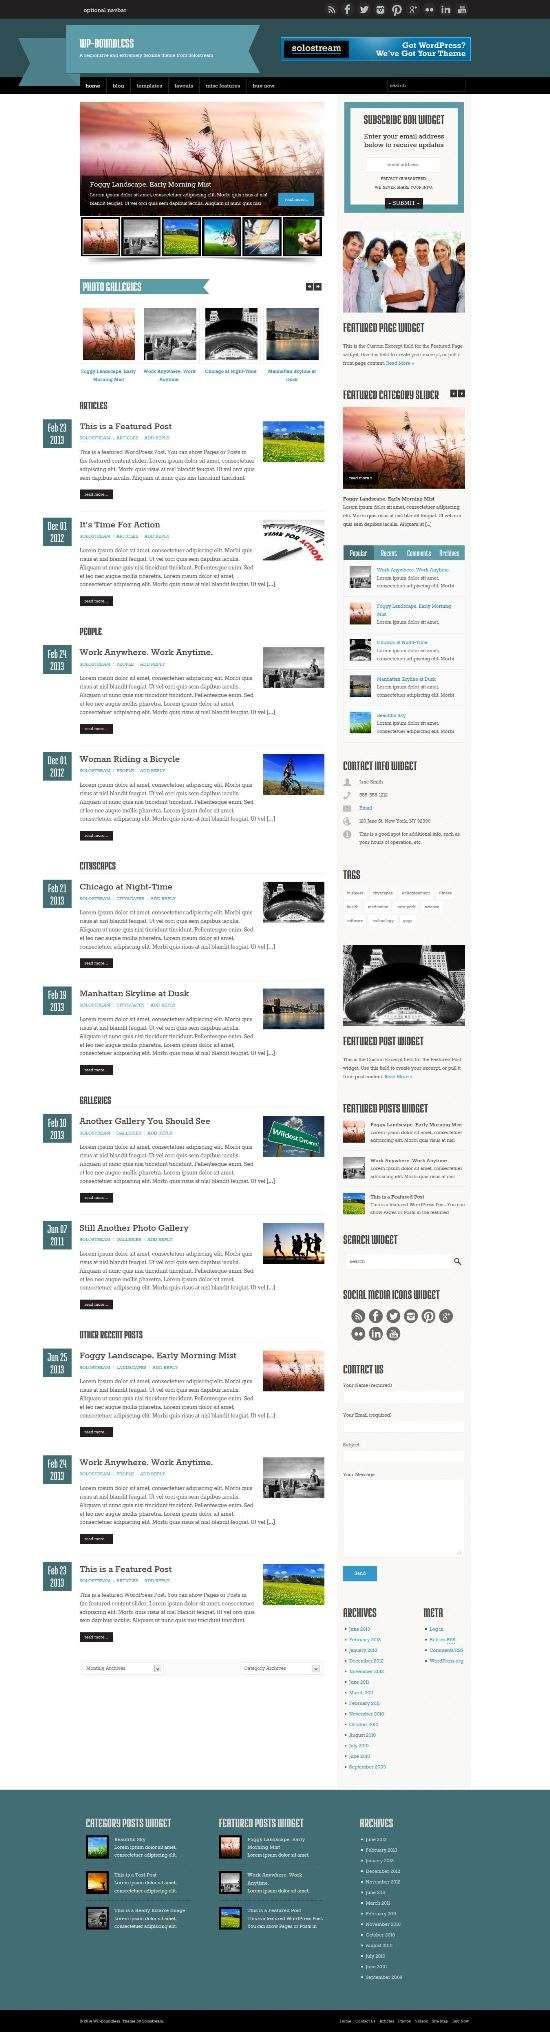 wp boundless solostream blog magazine - WP-Boundless WordPress Theme